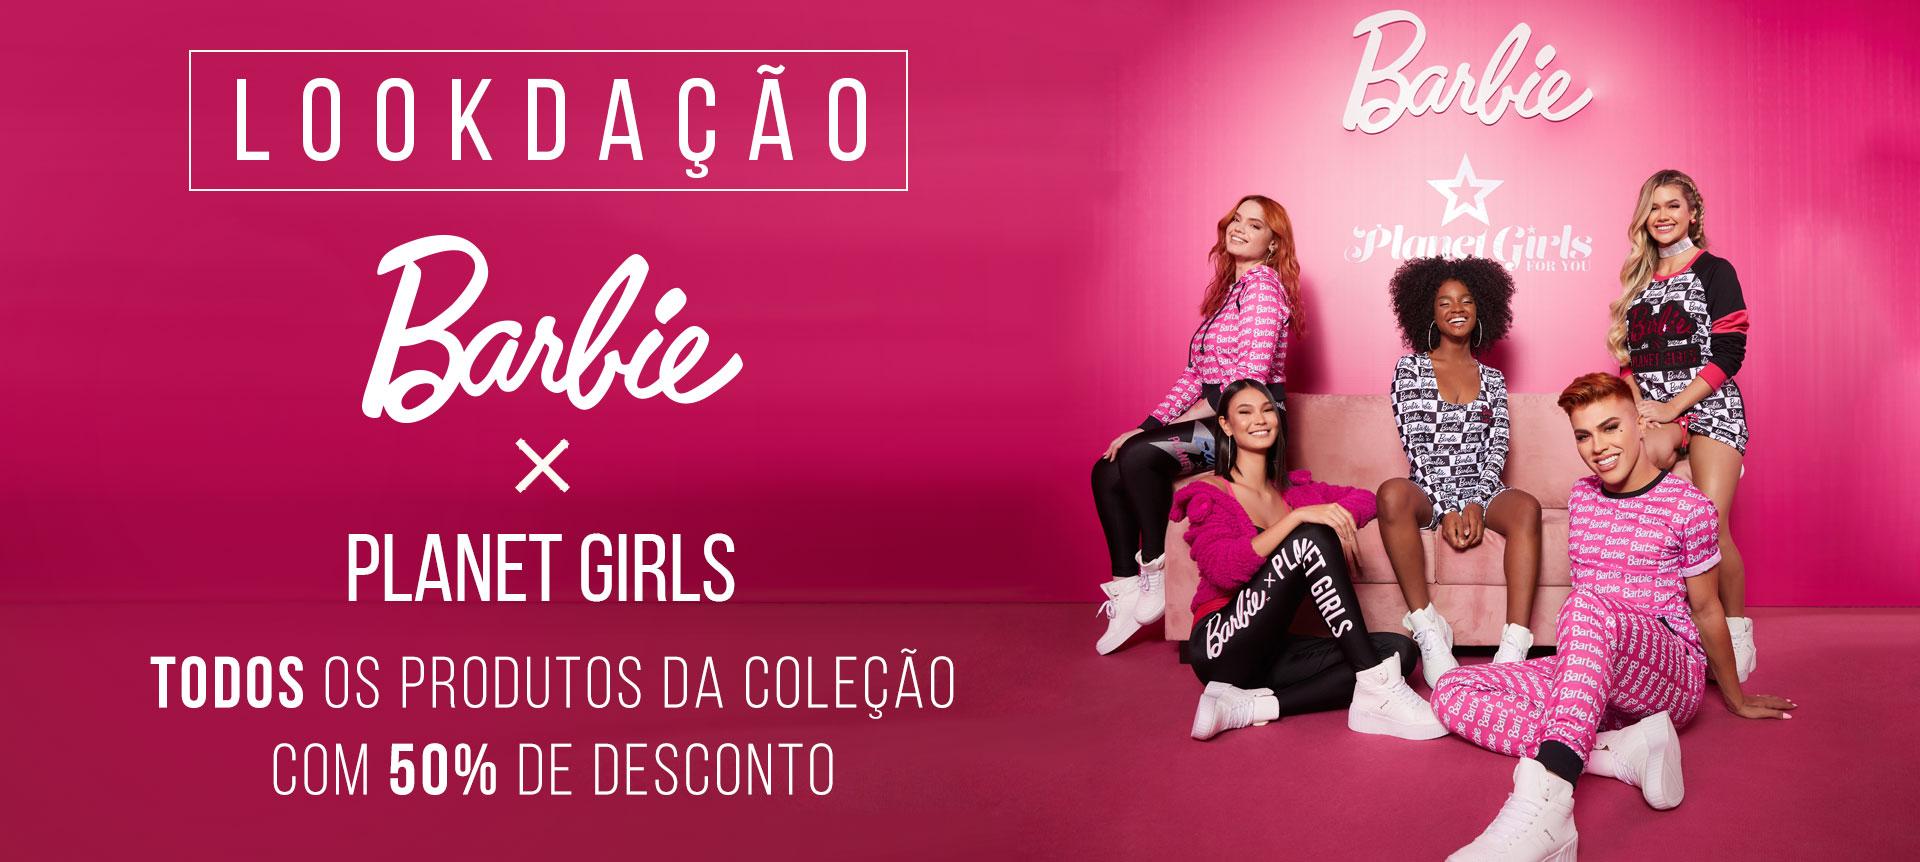 Lookdação - Barbie